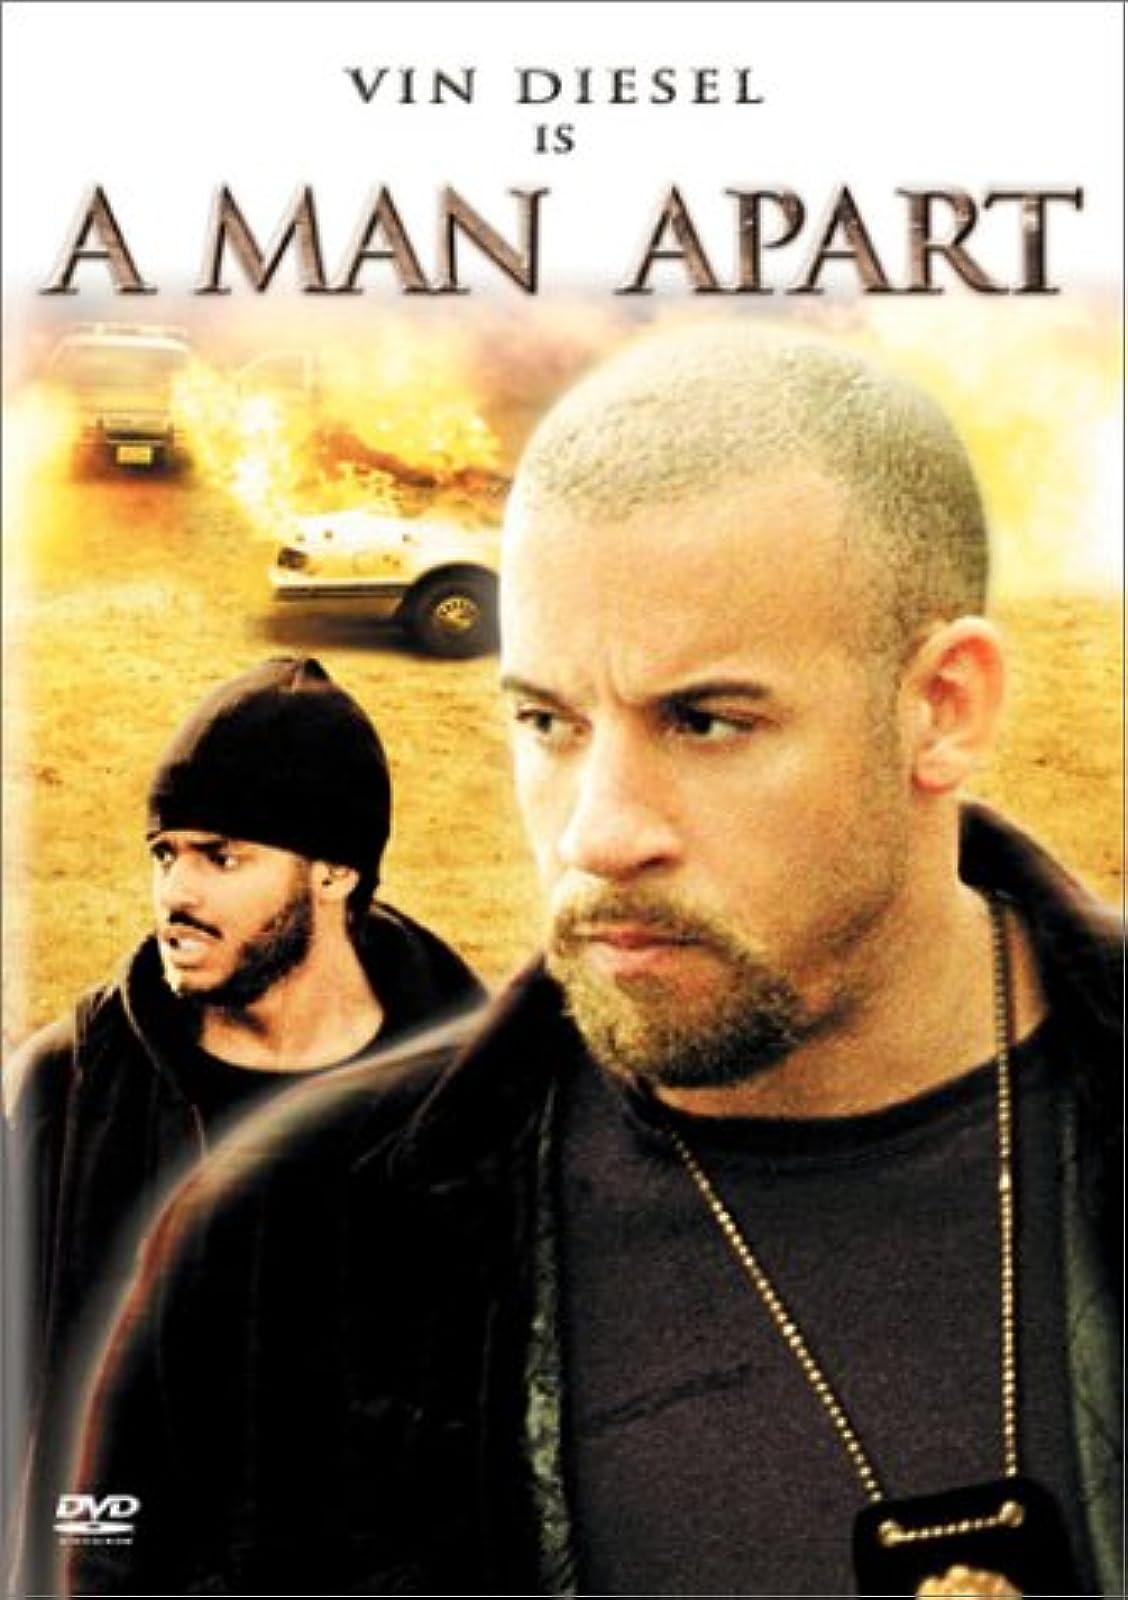 A Man Apart On DVD With Vin Diesel